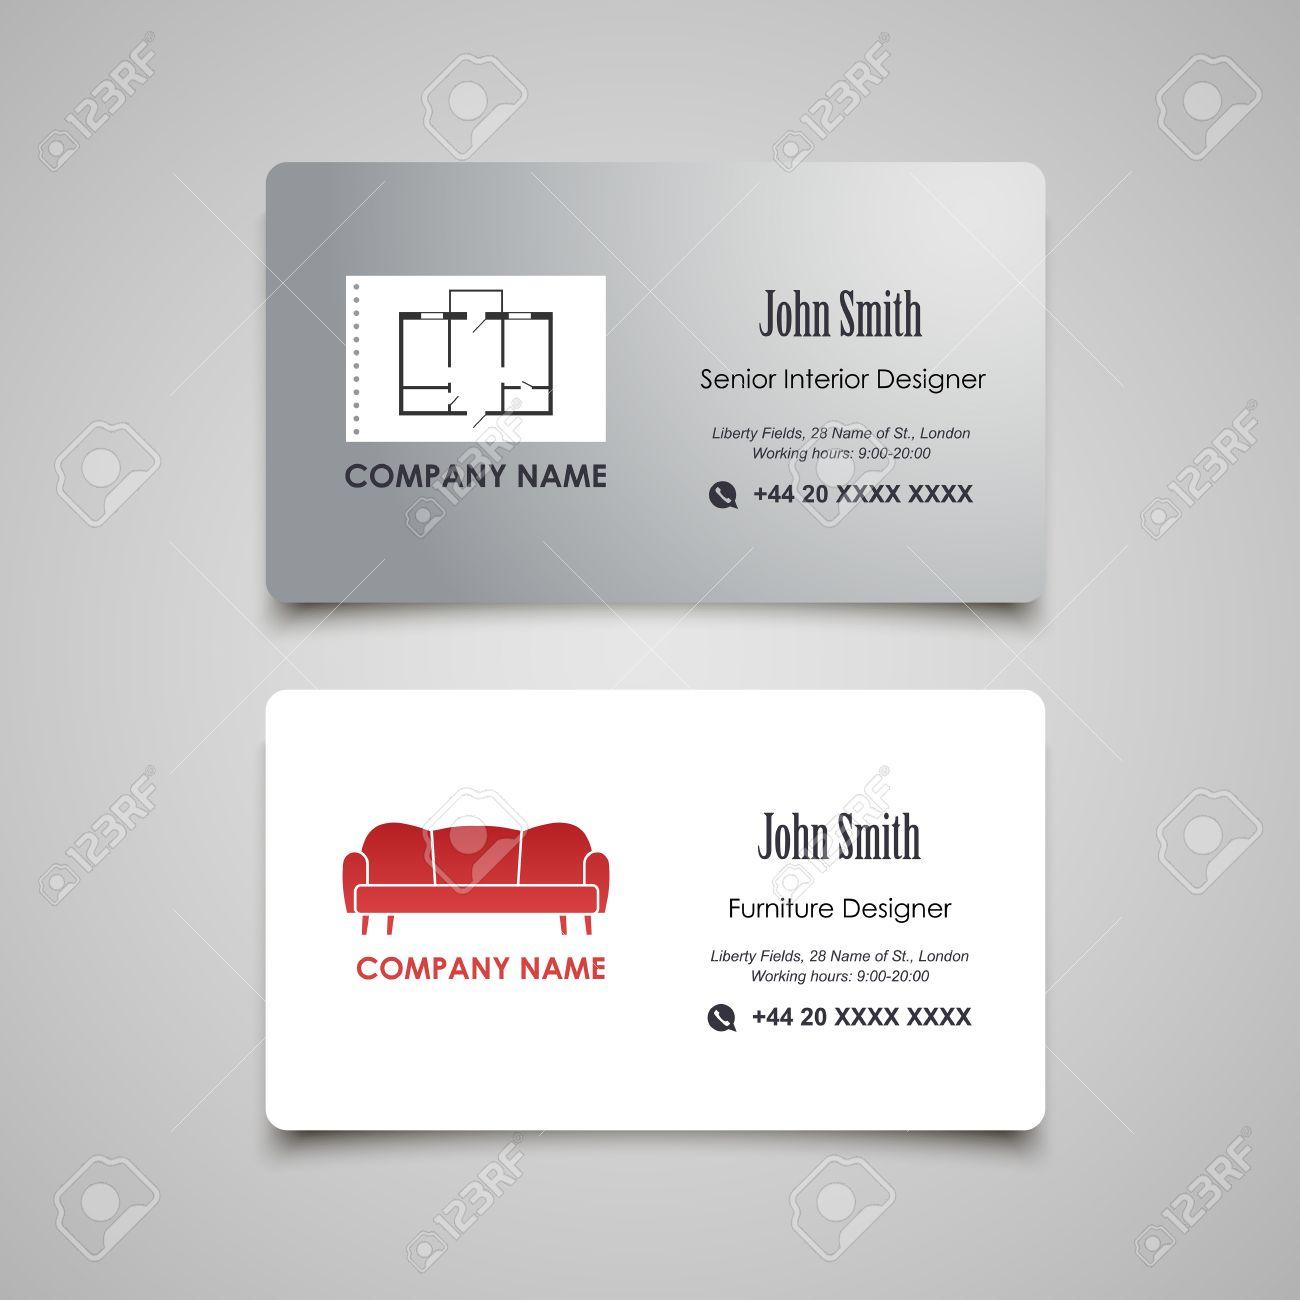 Interior And Furniture Designer Vector Business Card Template - Interior design business cards templates free